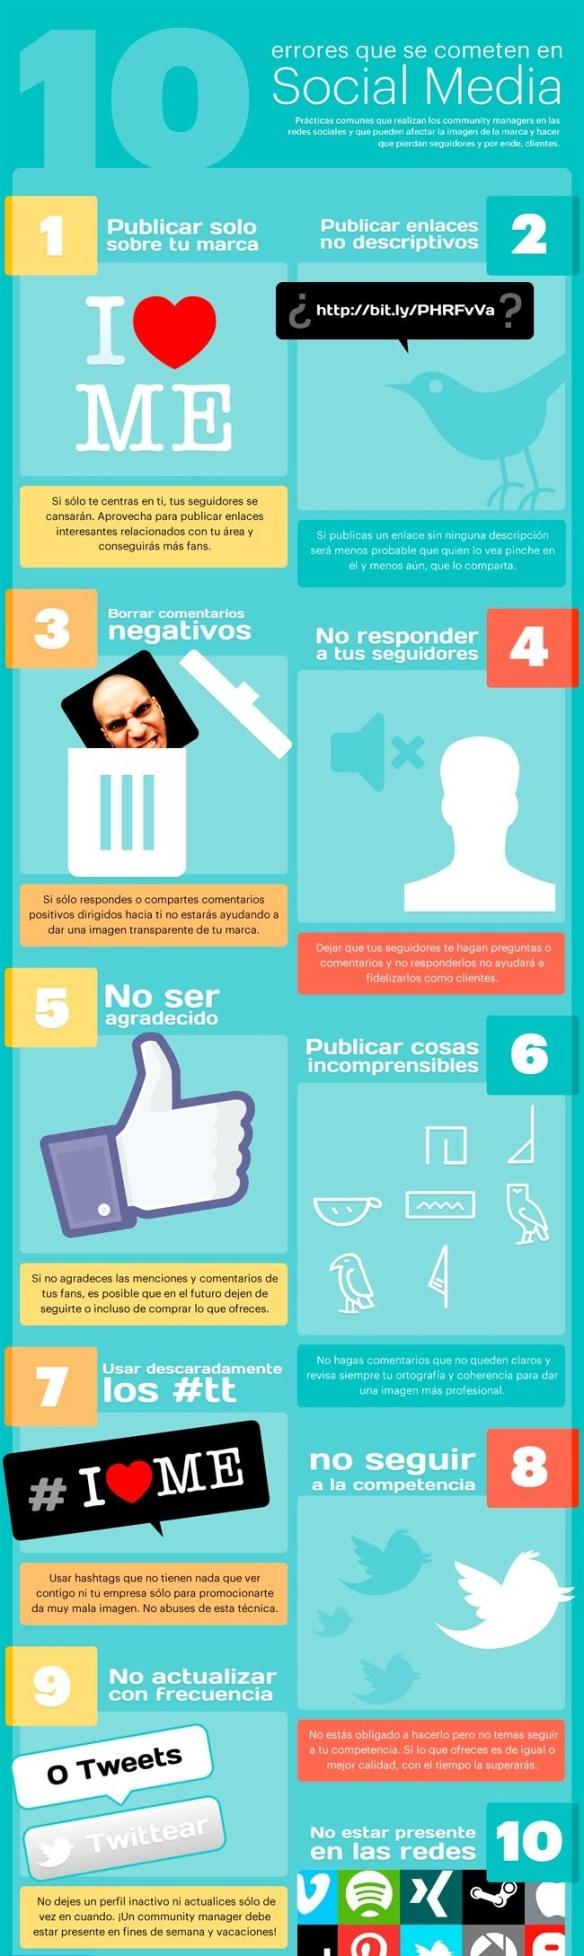 infografia-errores -en-Social-Media